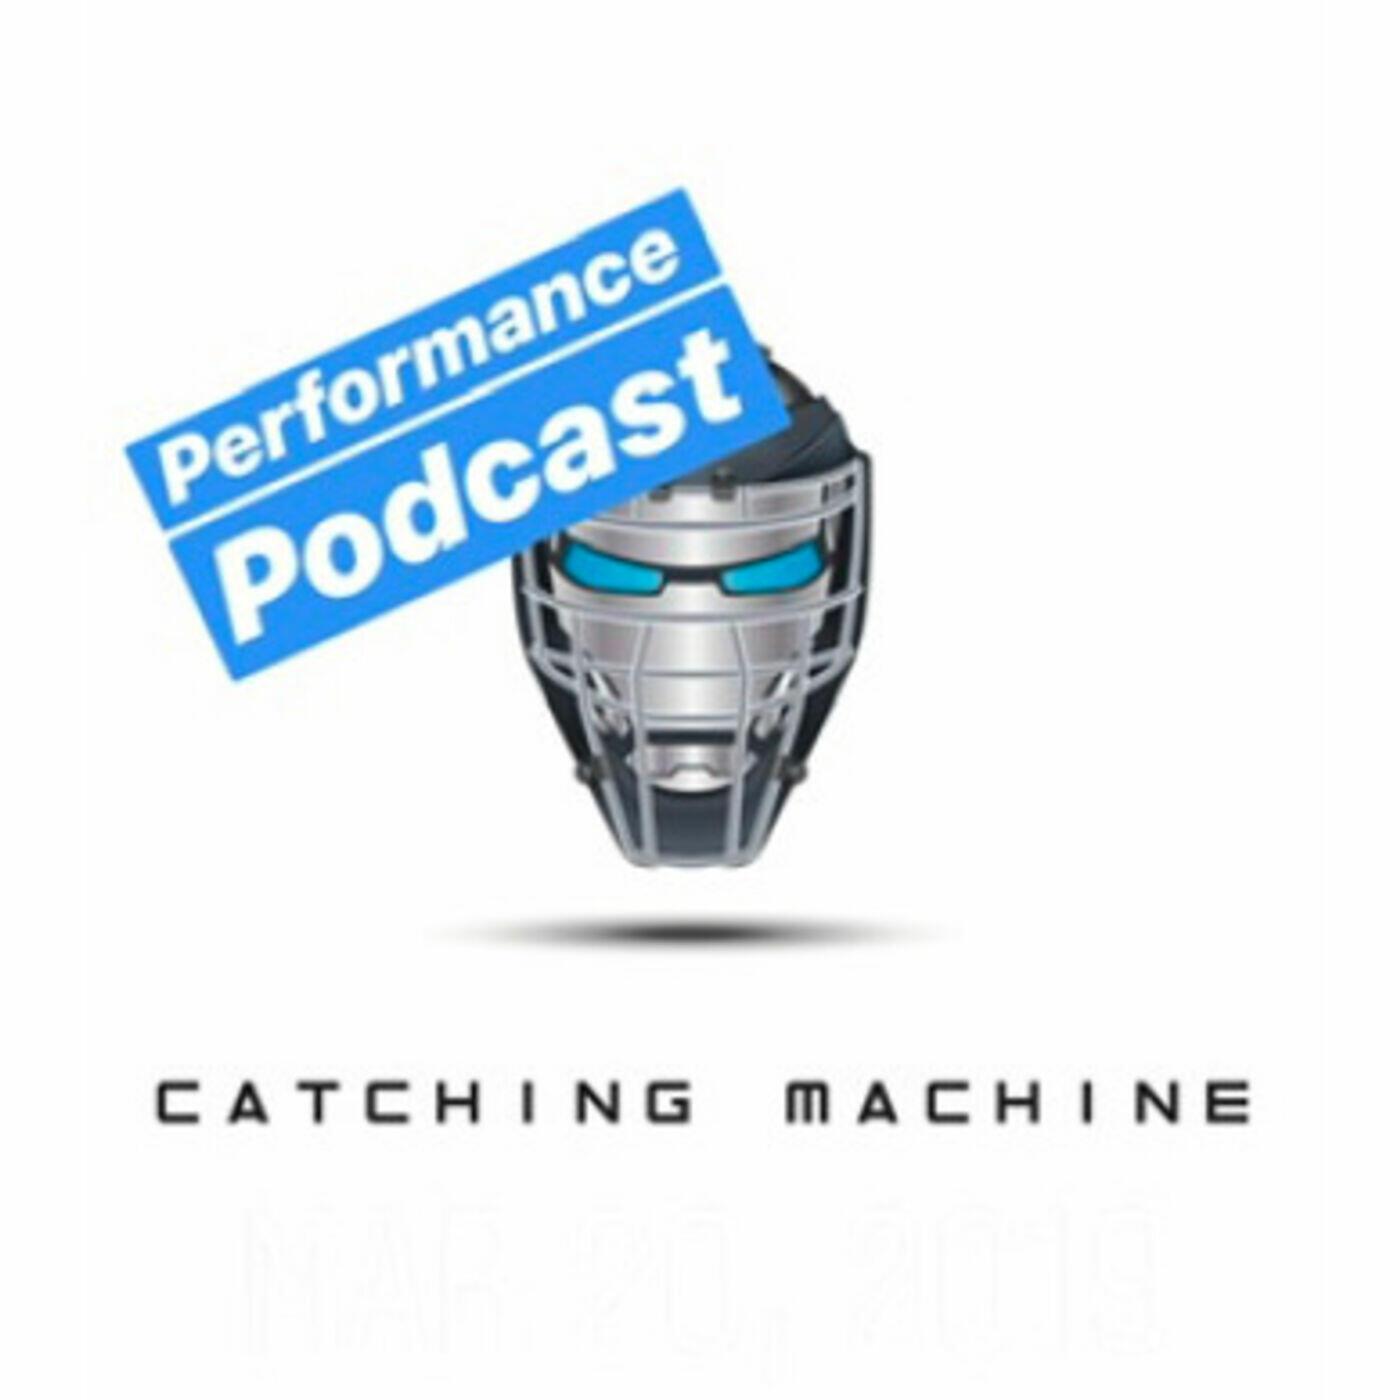 Catching Machine Performance Podcast